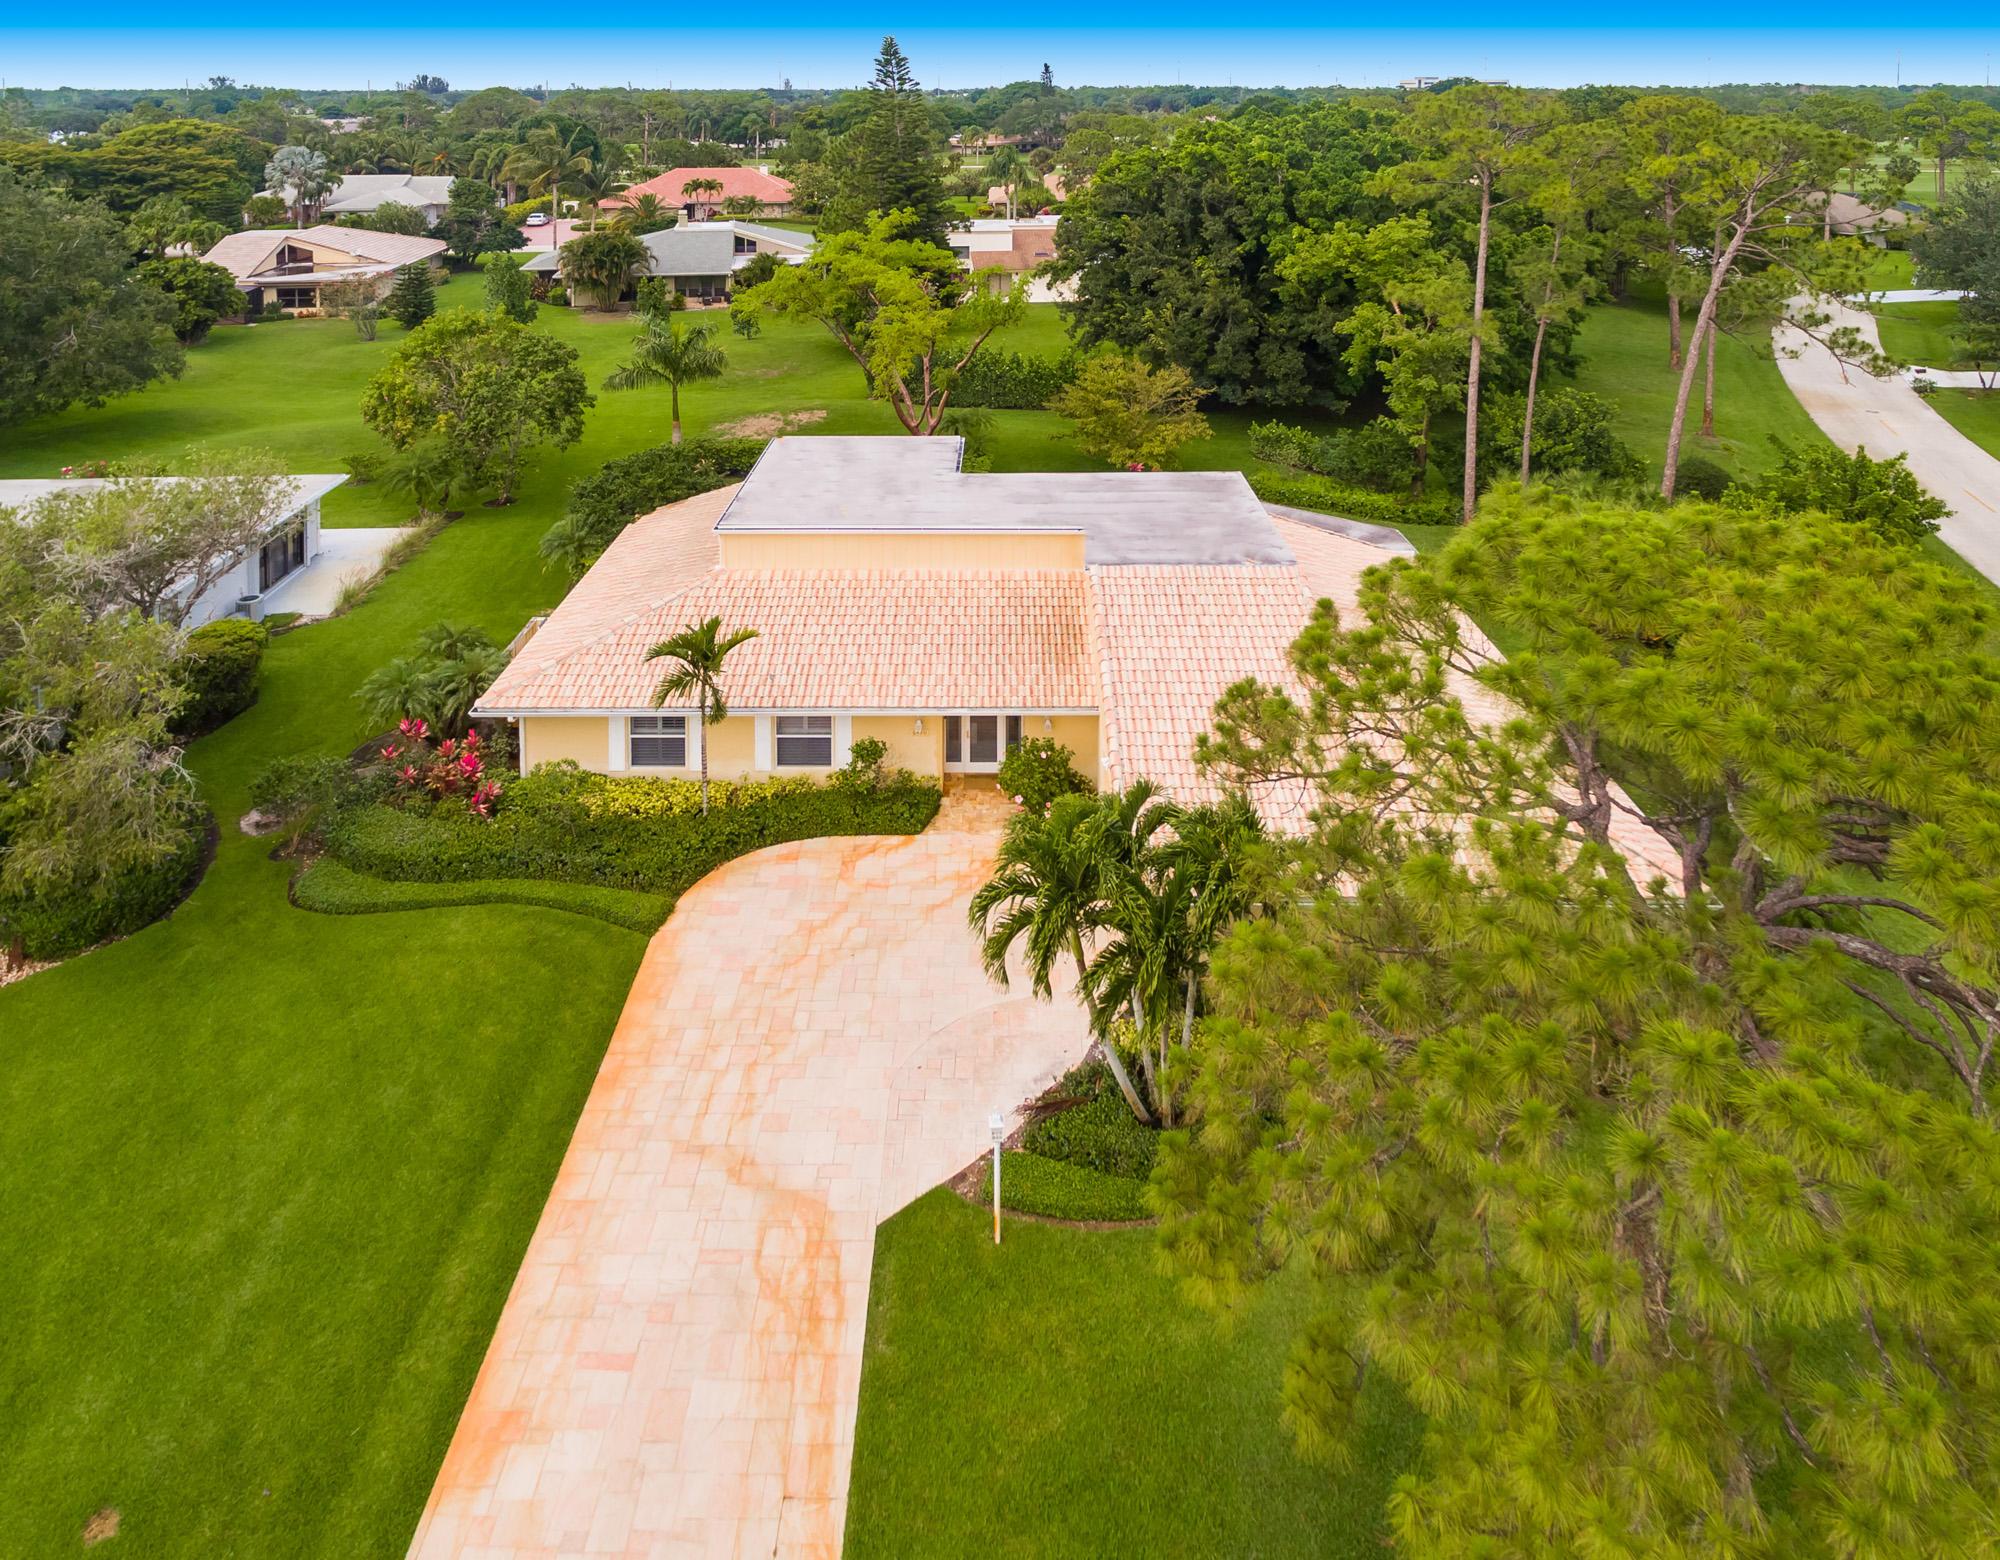 6420 Eastpointe Pines Street, Palm Beach Gardens, Florida 33418, 4 Bedrooms Bedrooms, ,2.1 BathroomsBathrooms,A,Single family,Eastpointe Pines,RX-10433148